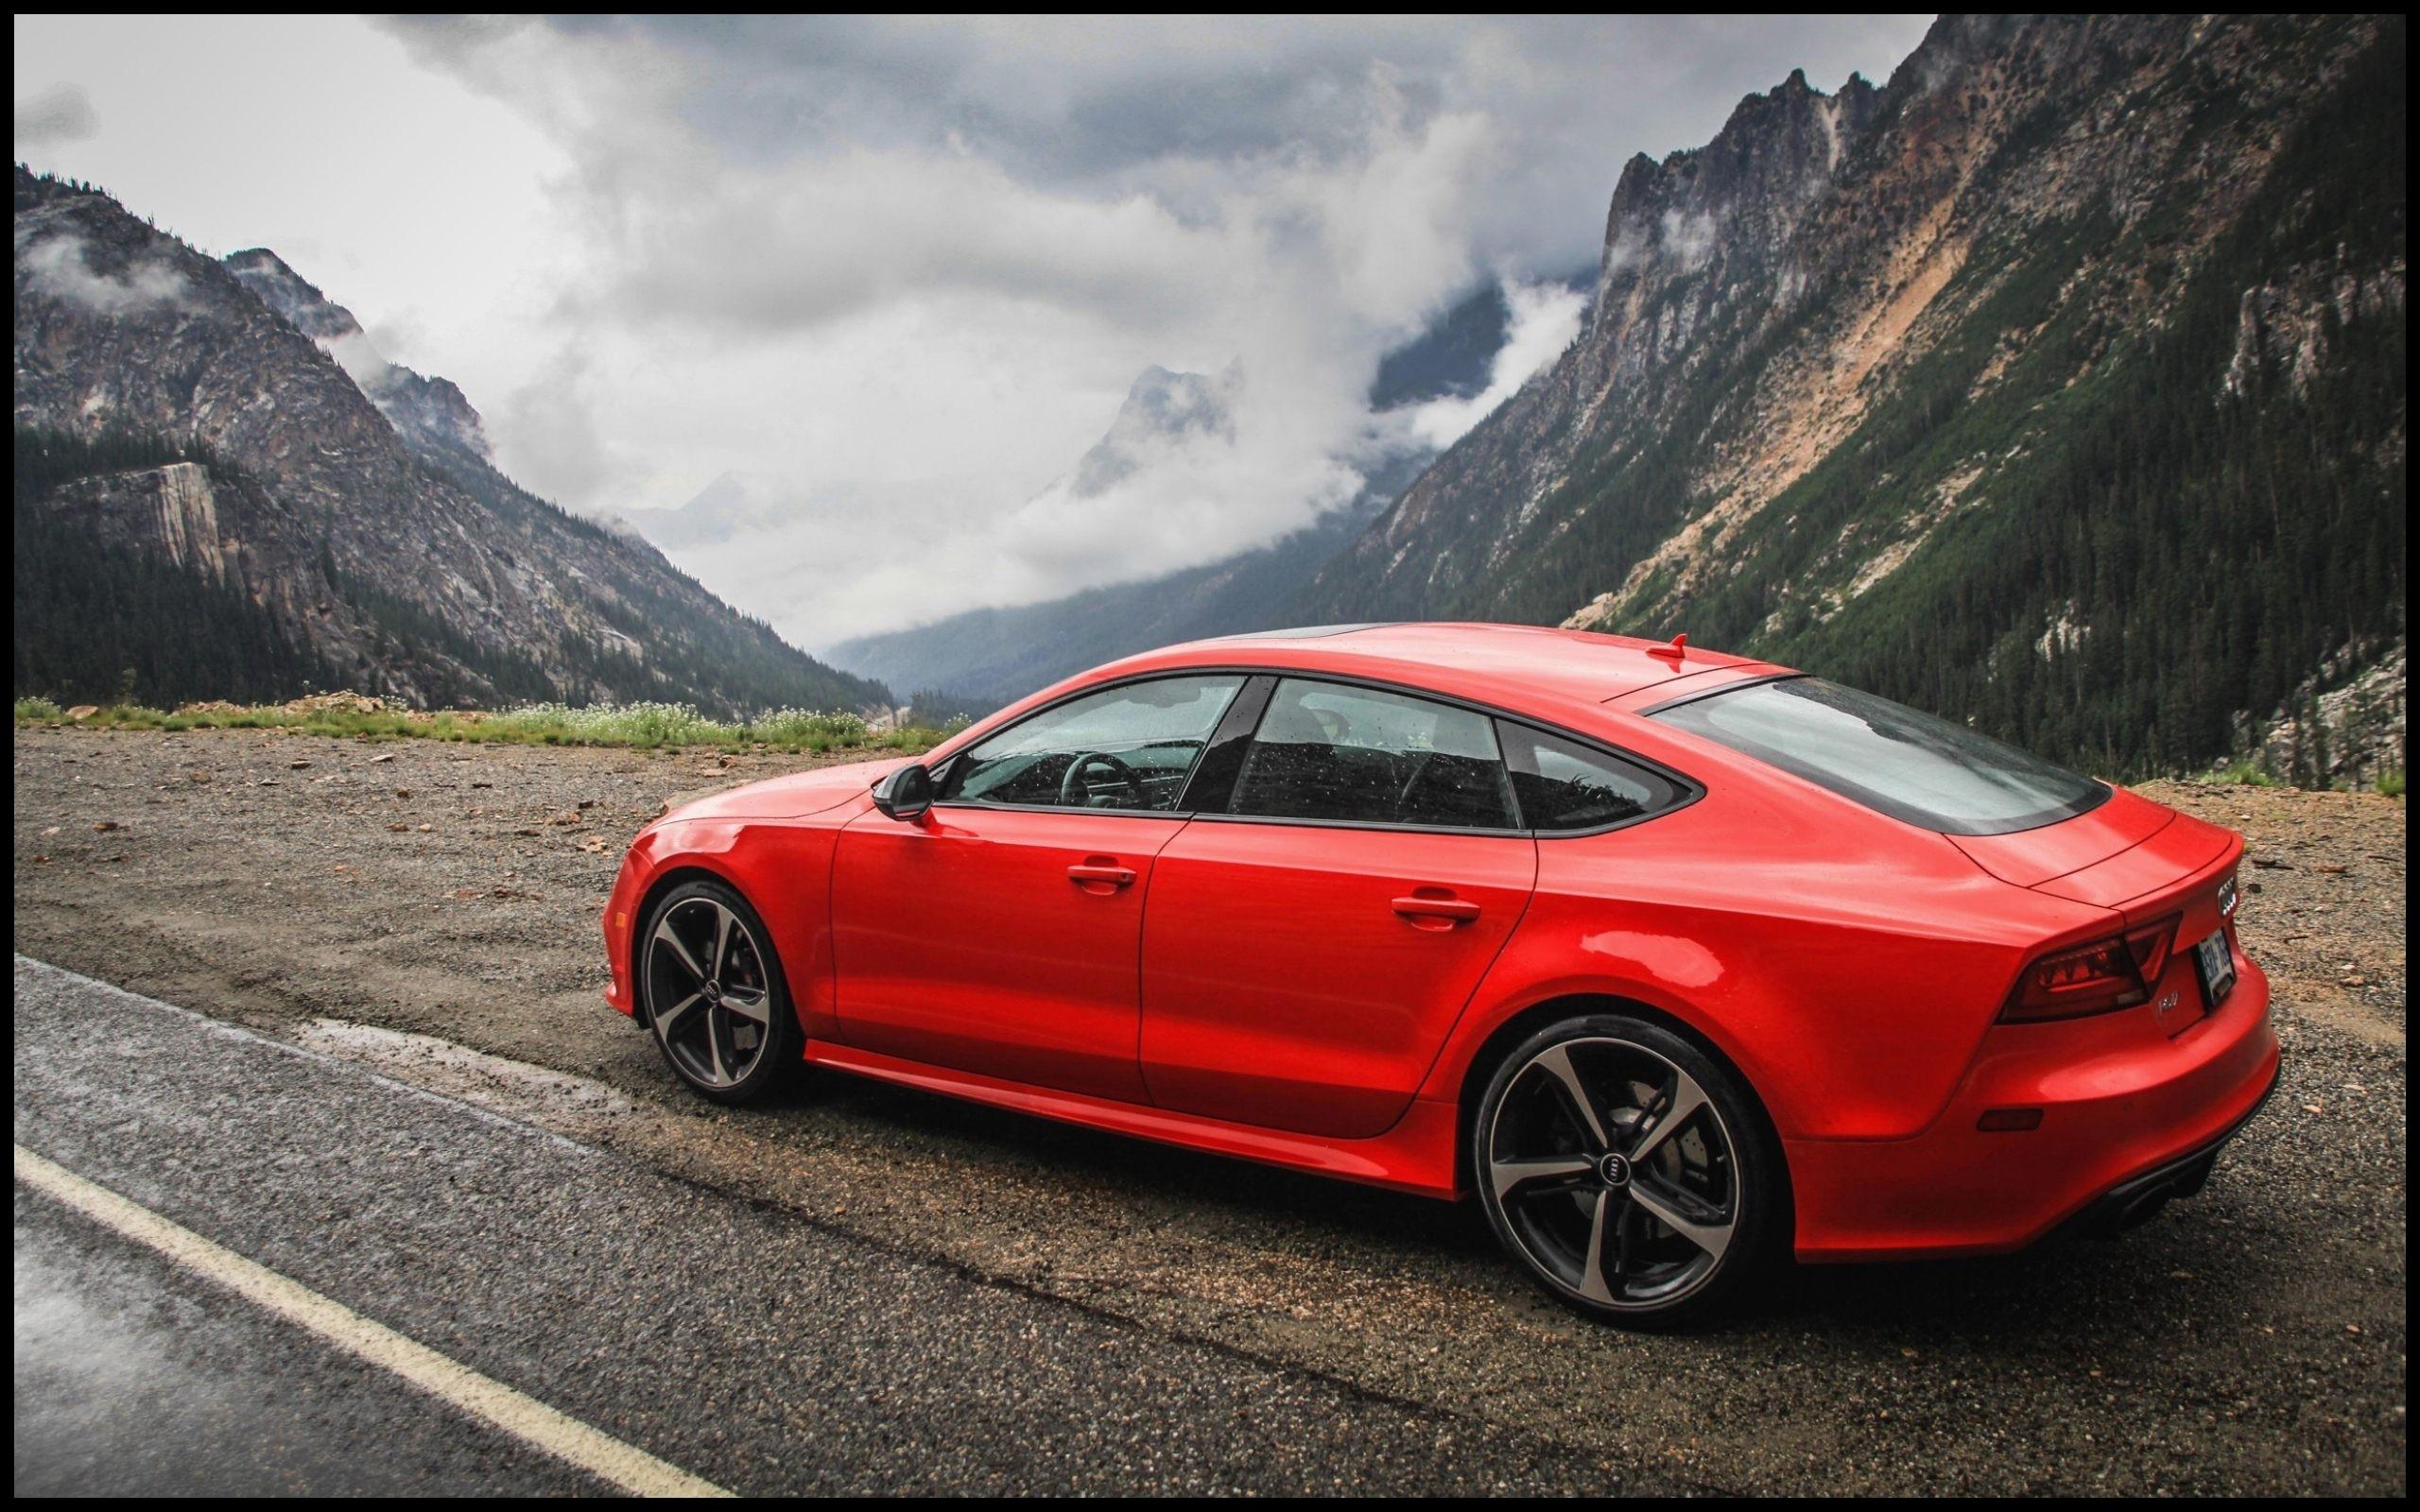 Audi S7 Interior Fresh Bmw X5 Interior 2016 Seats Best Bmw X5 3 0d M Sport